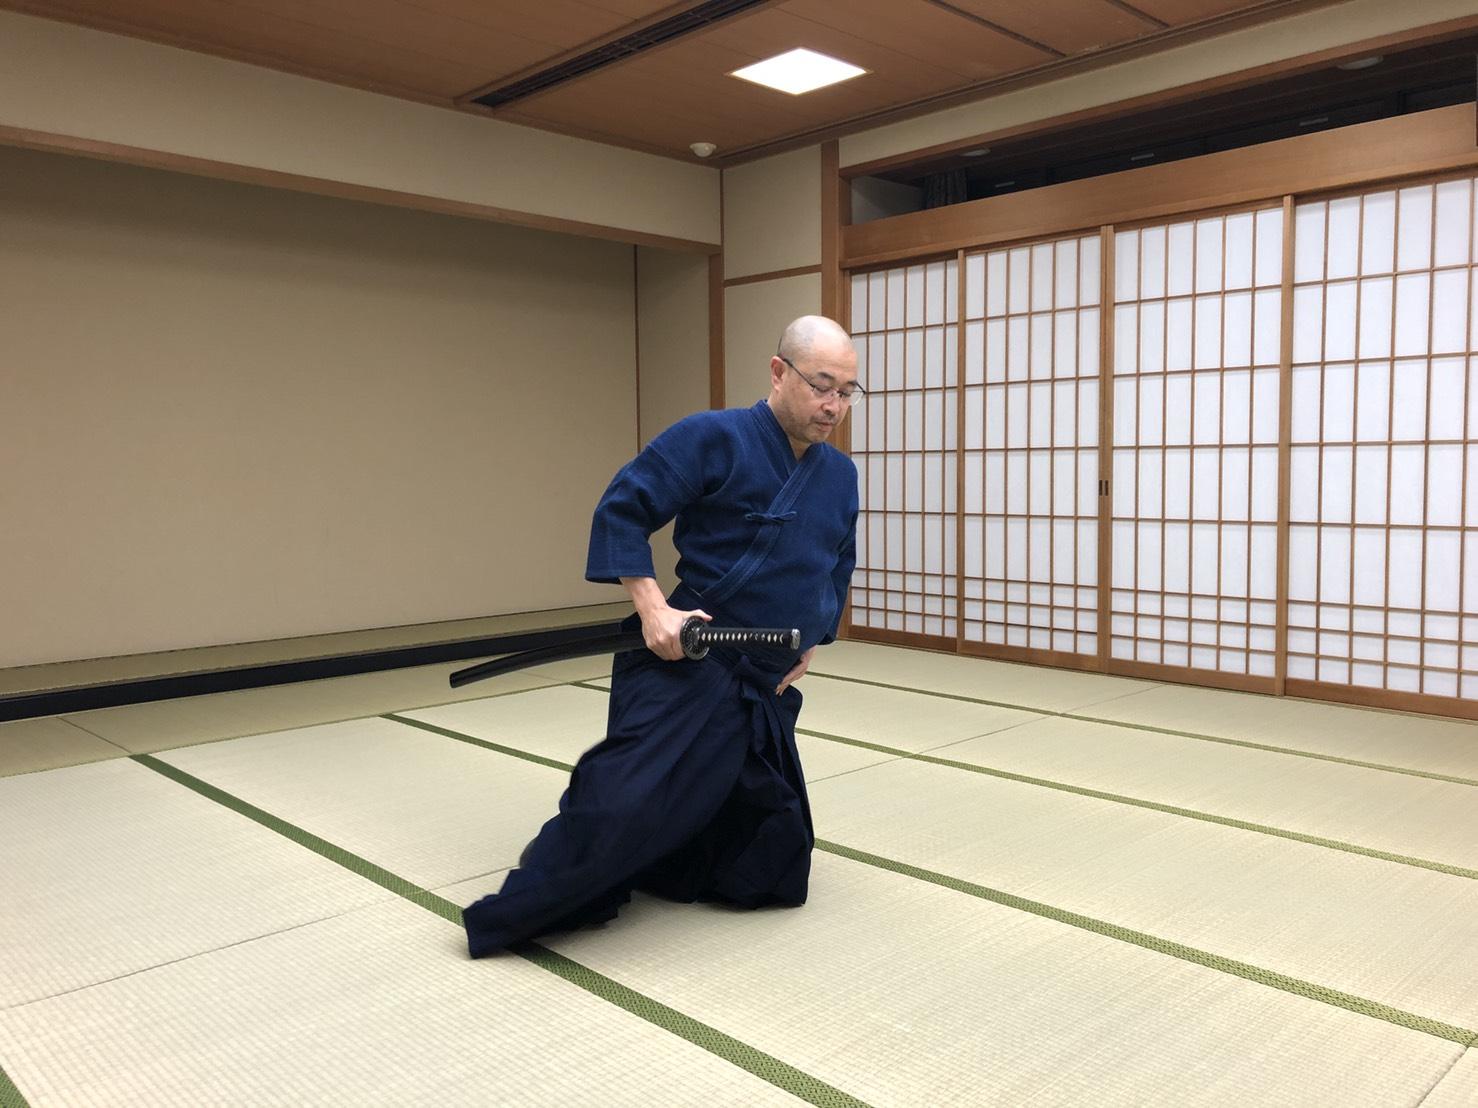 S  84181017 - 釈正輪老師、武道礼法&呼吸法開催